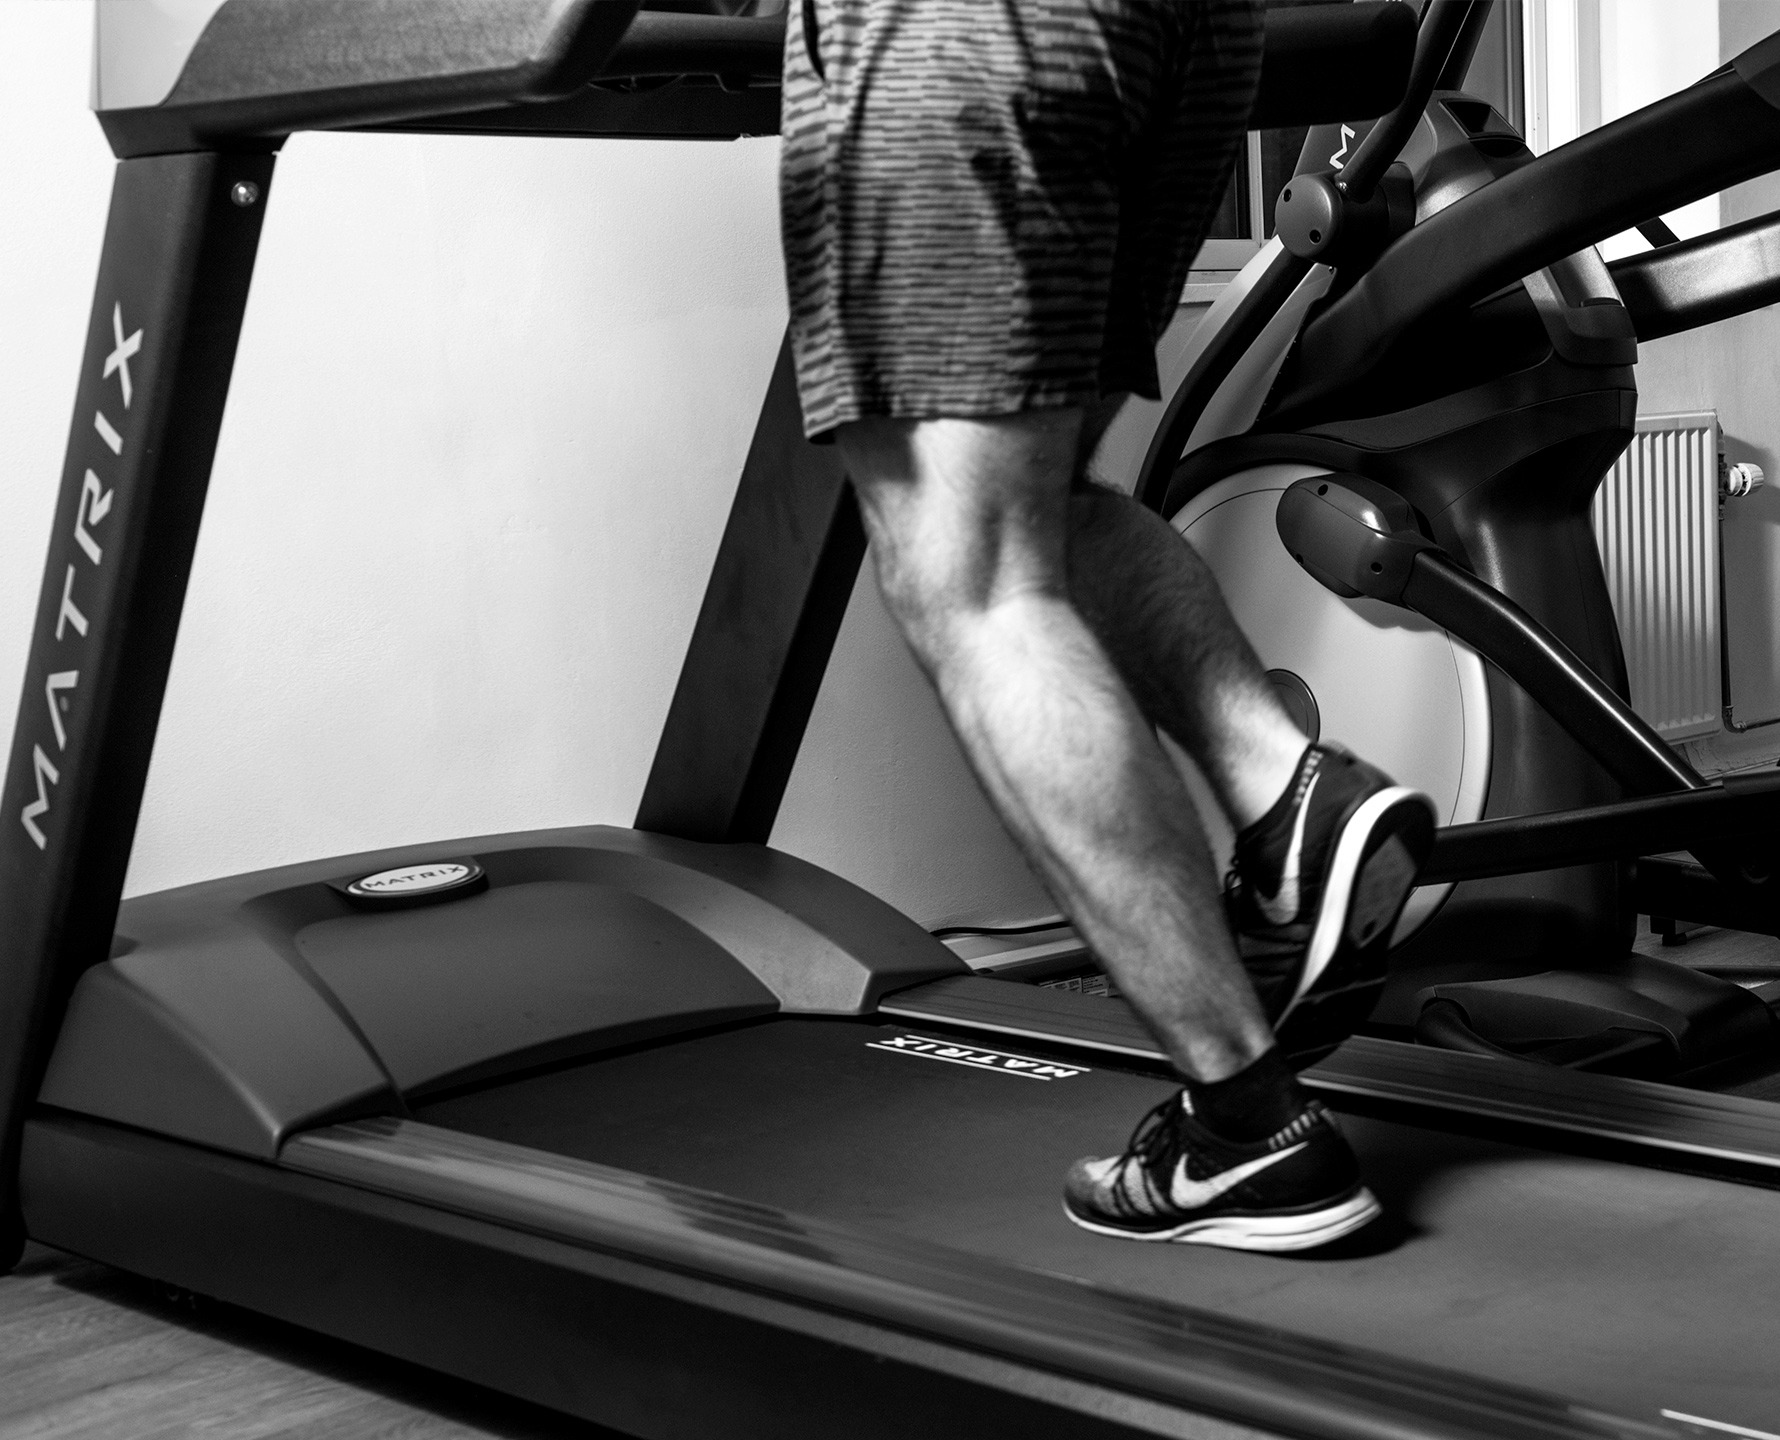 Løbestilsanalyse hos Sportsfysioterapien